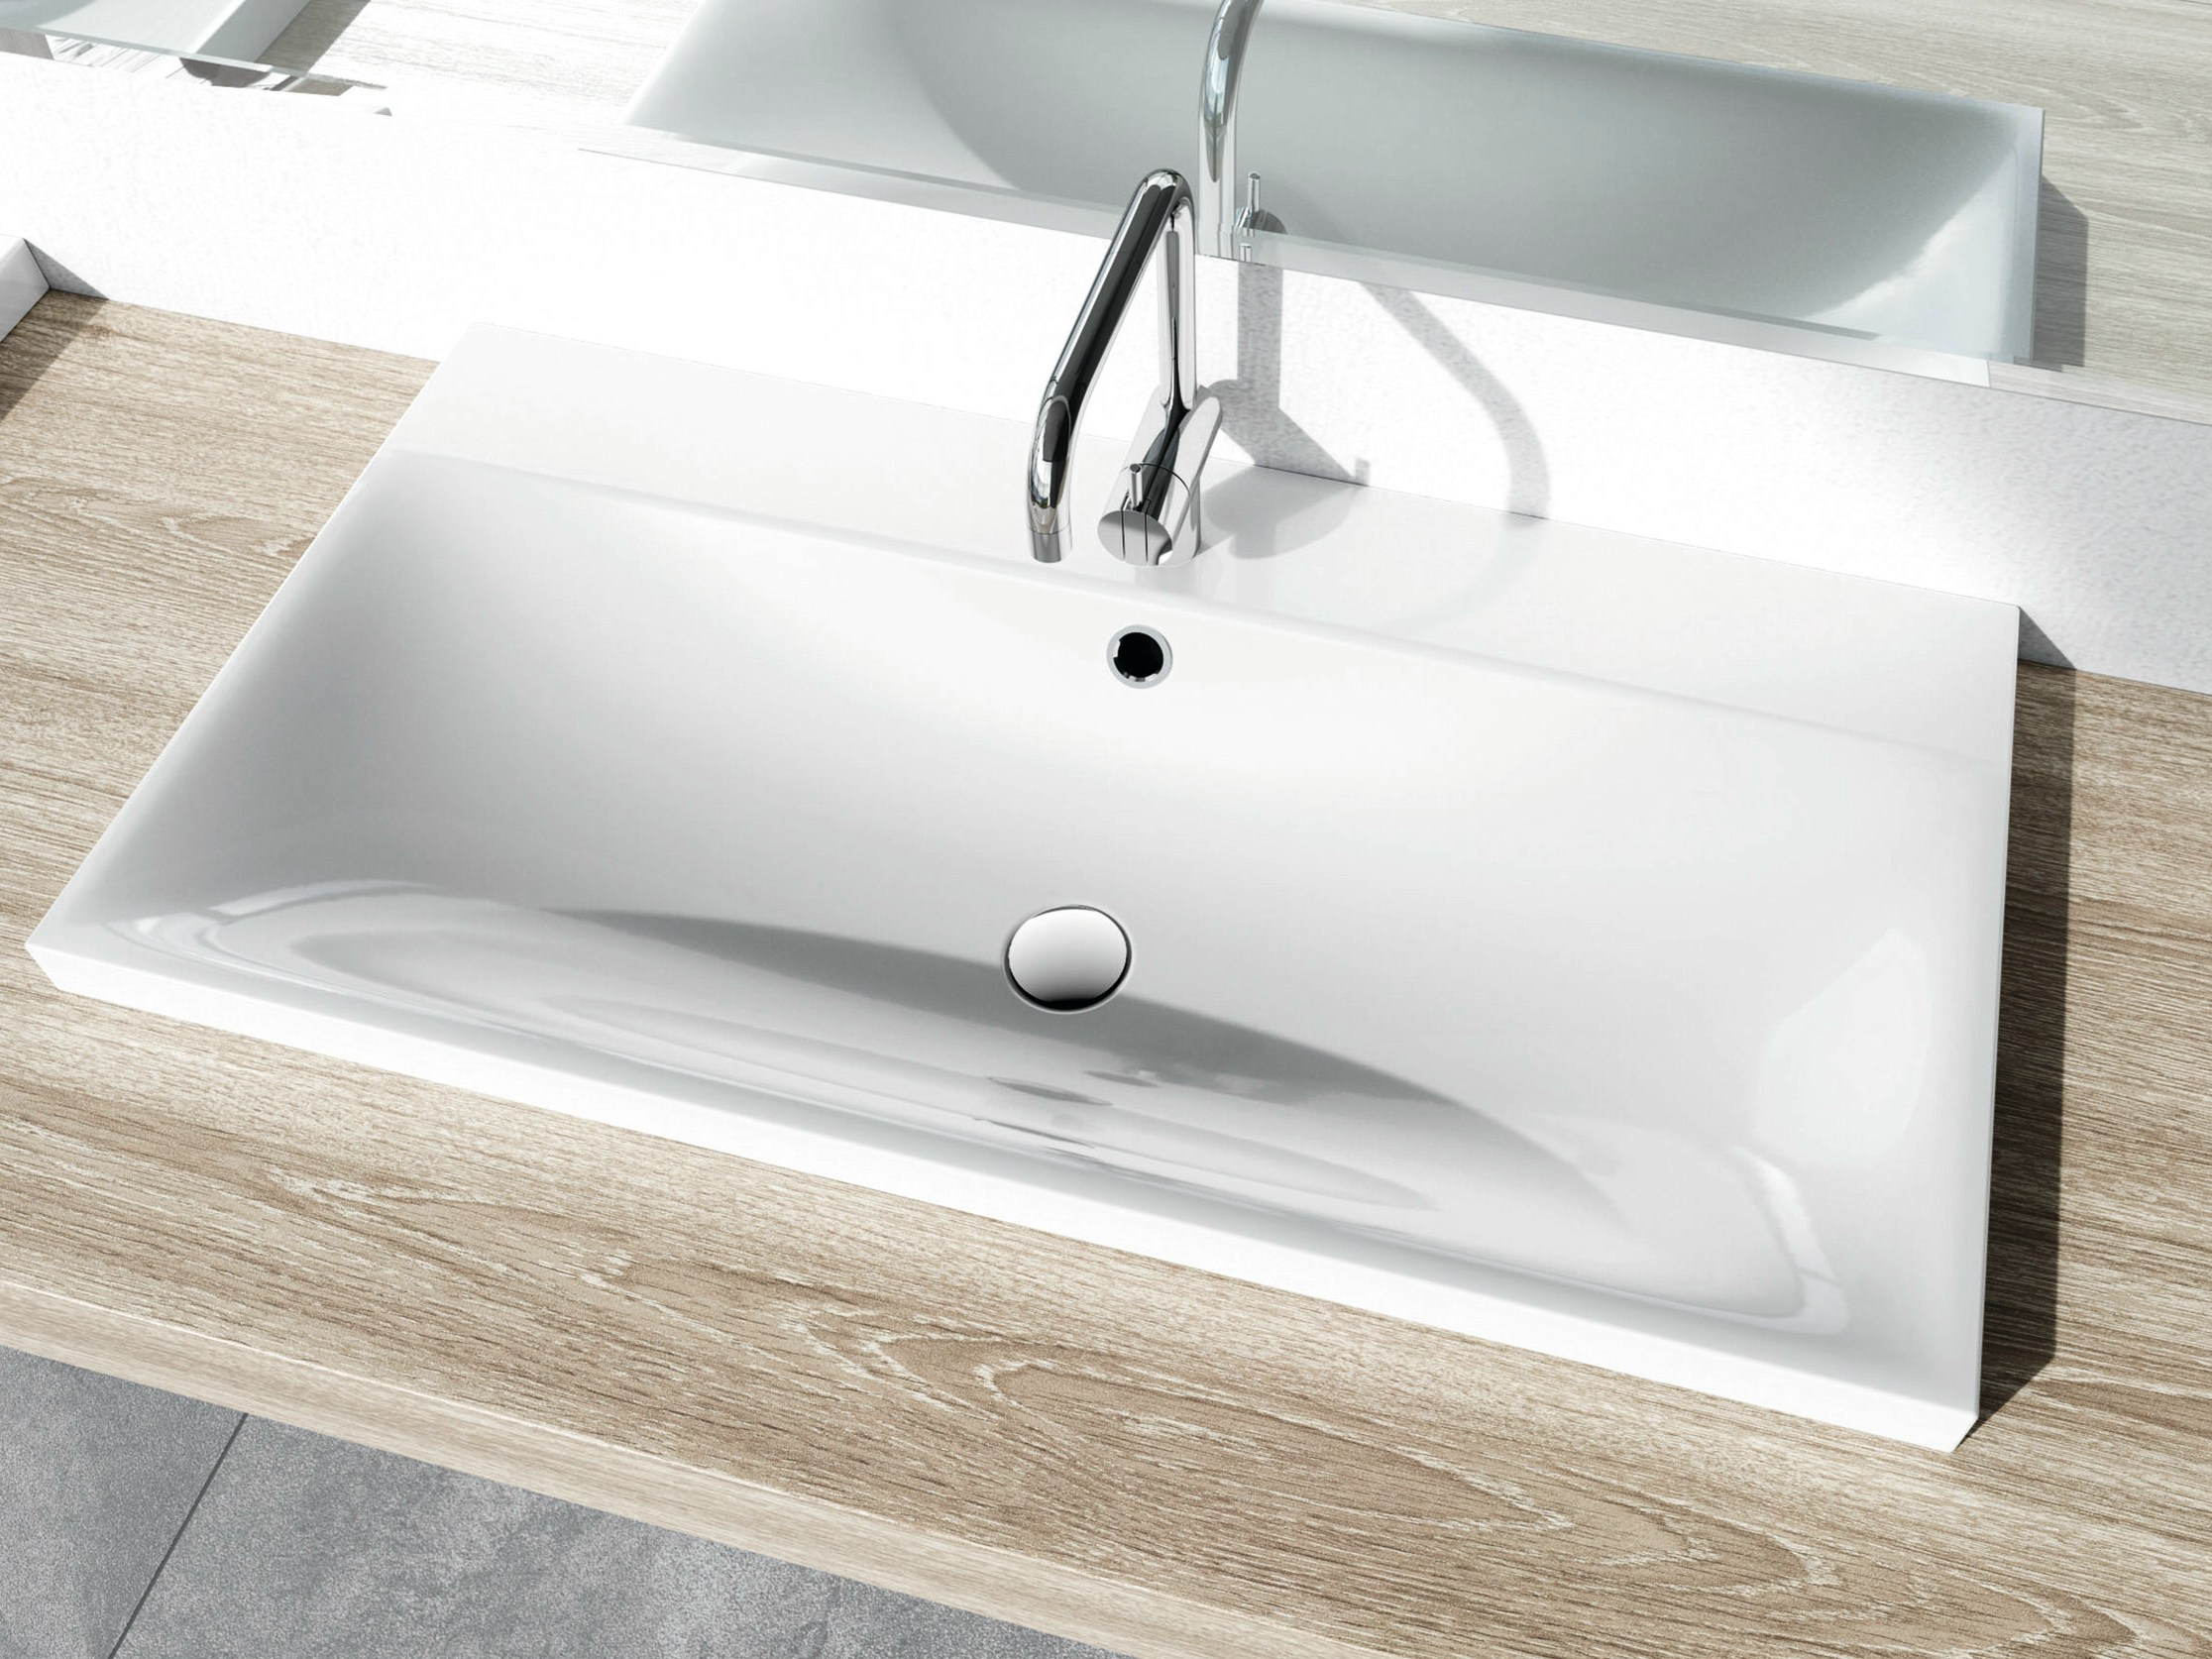 silenio waschbecken by kaldewei italia design anke salomon. Black Bedroom Furniture Sets. Home Design Ideas